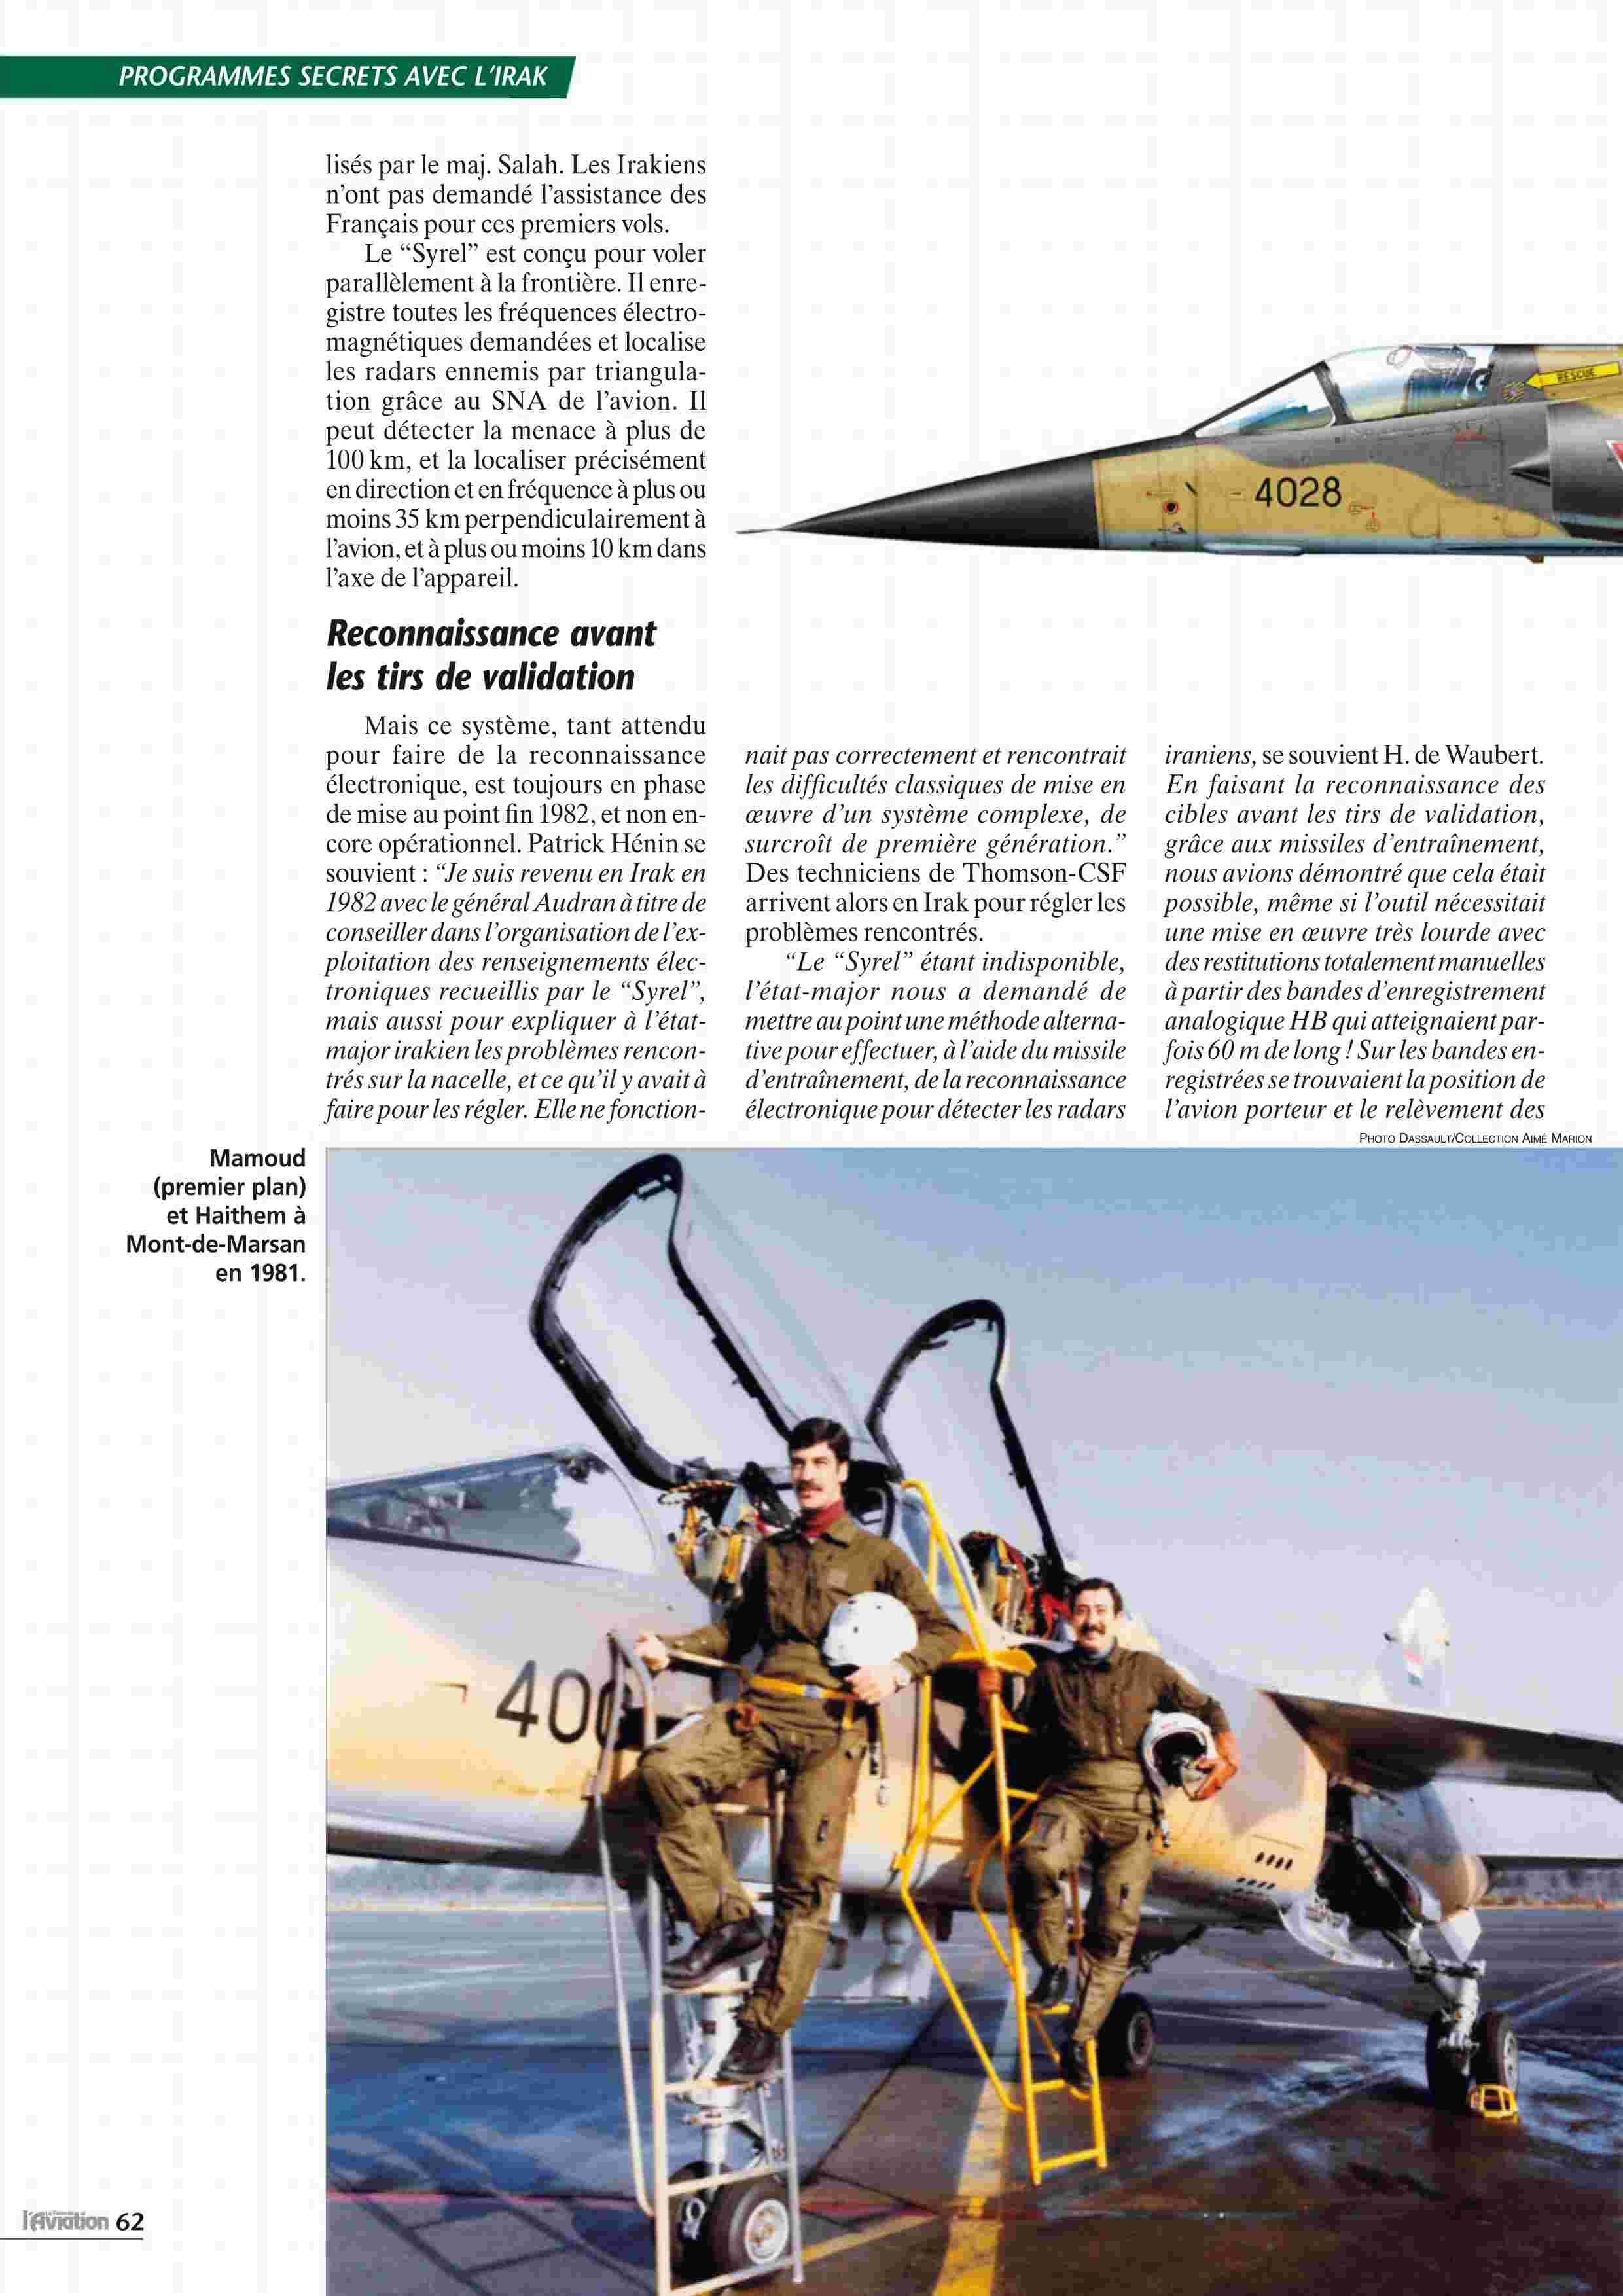 Guerre Iran-Irak - Page 3 A03810